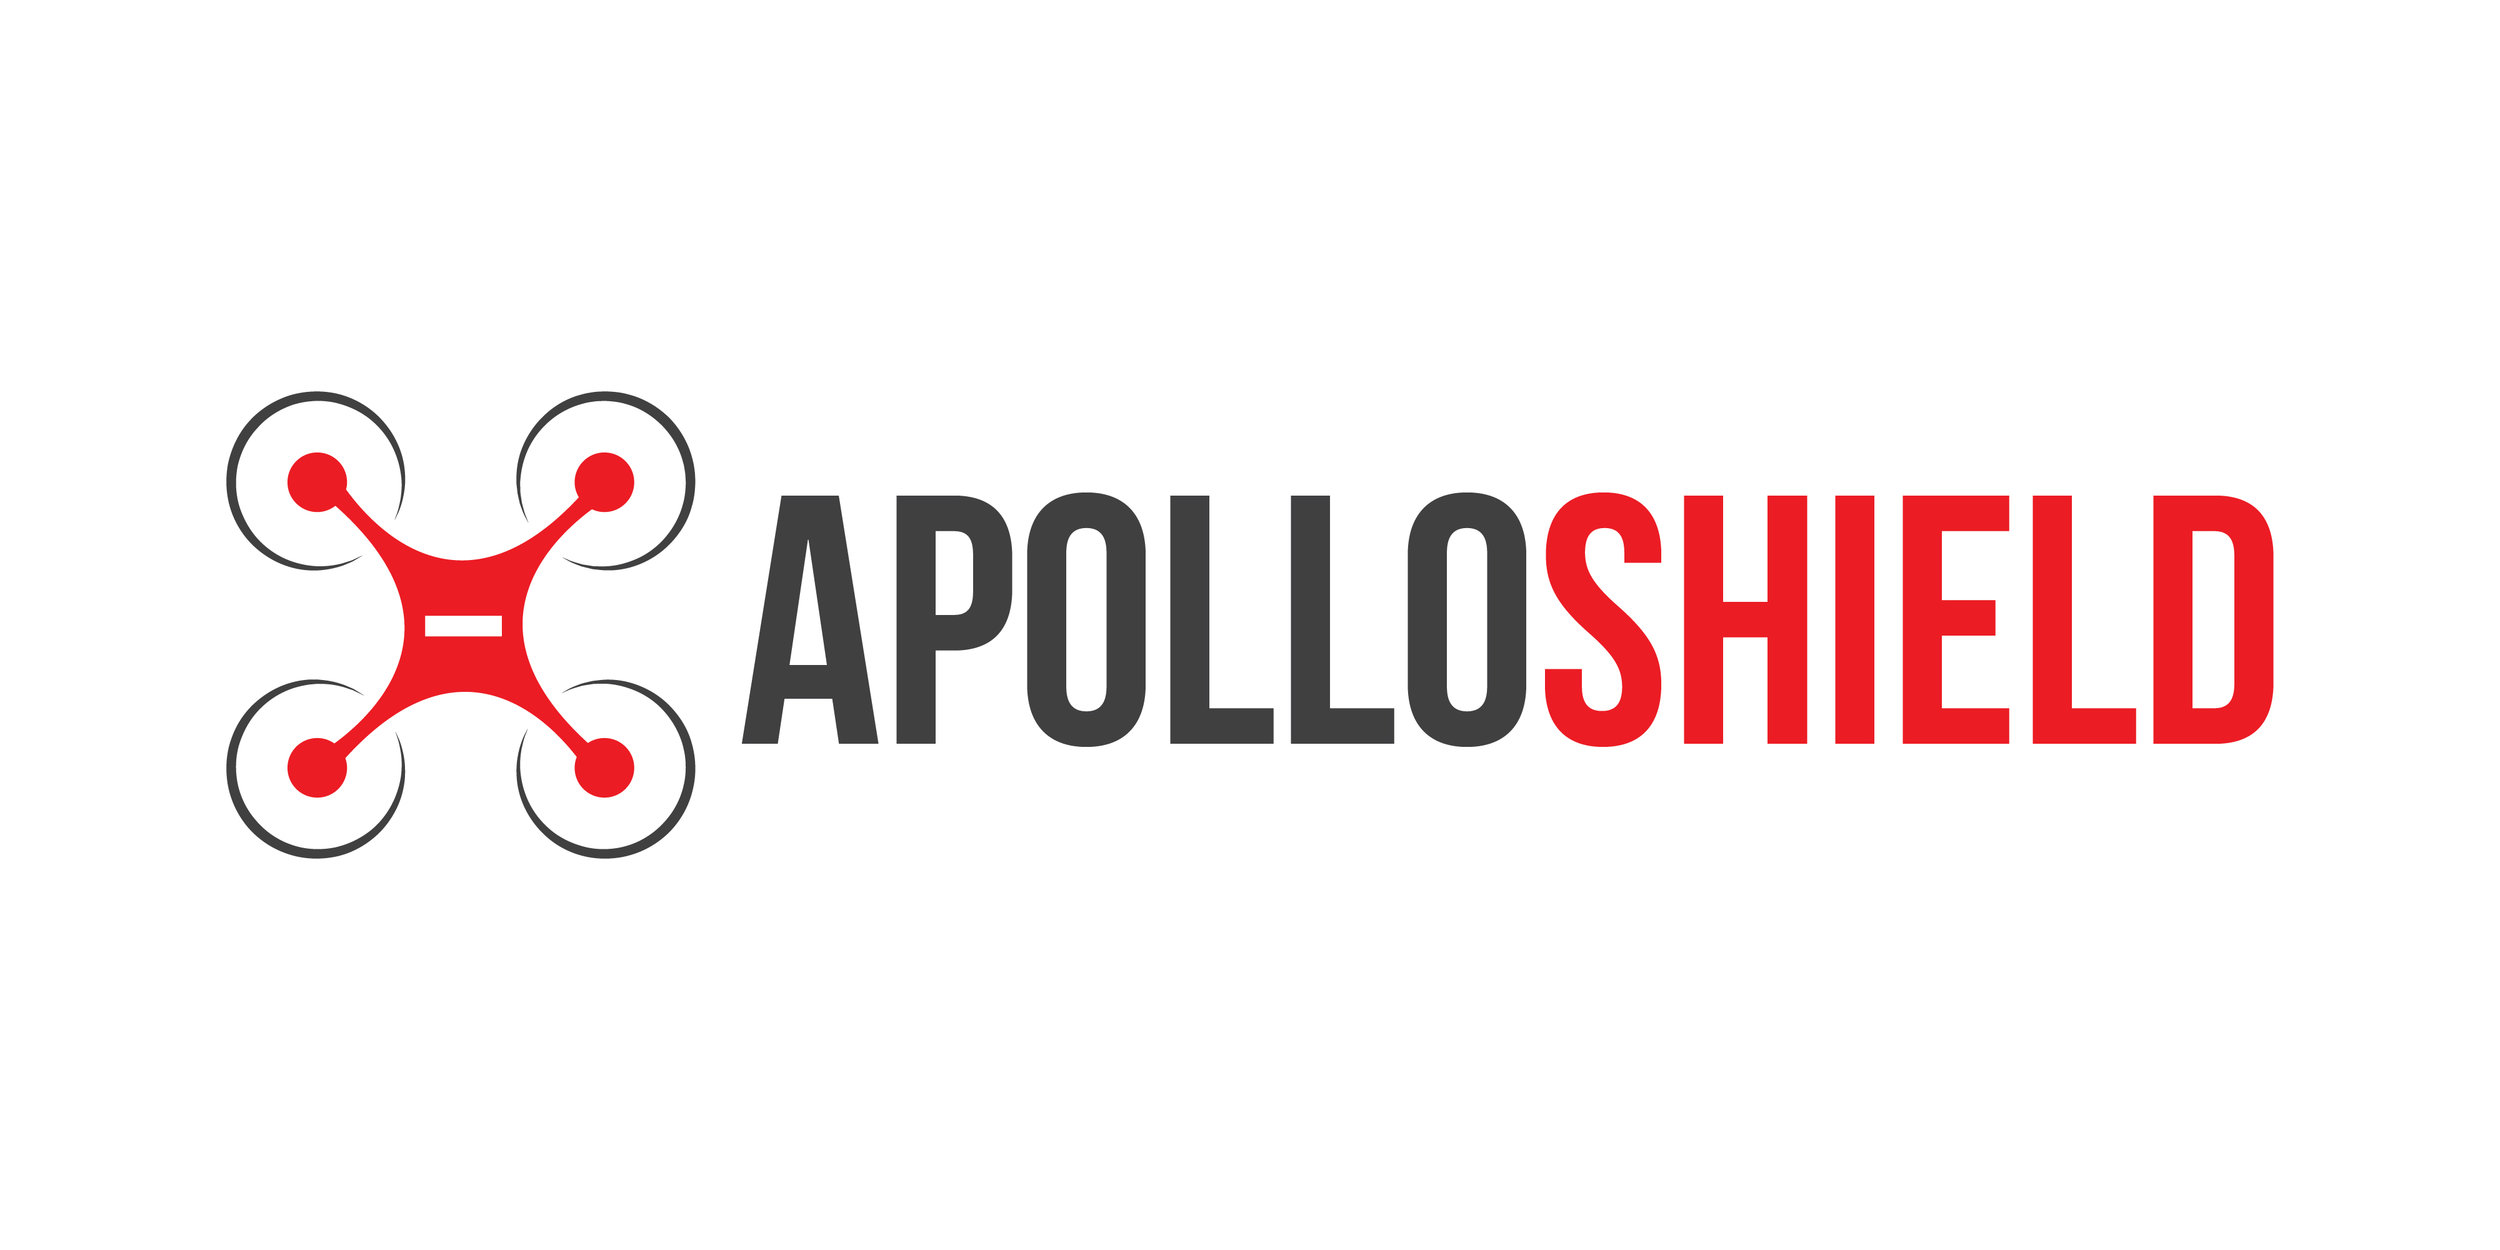 apollo shield.jpg